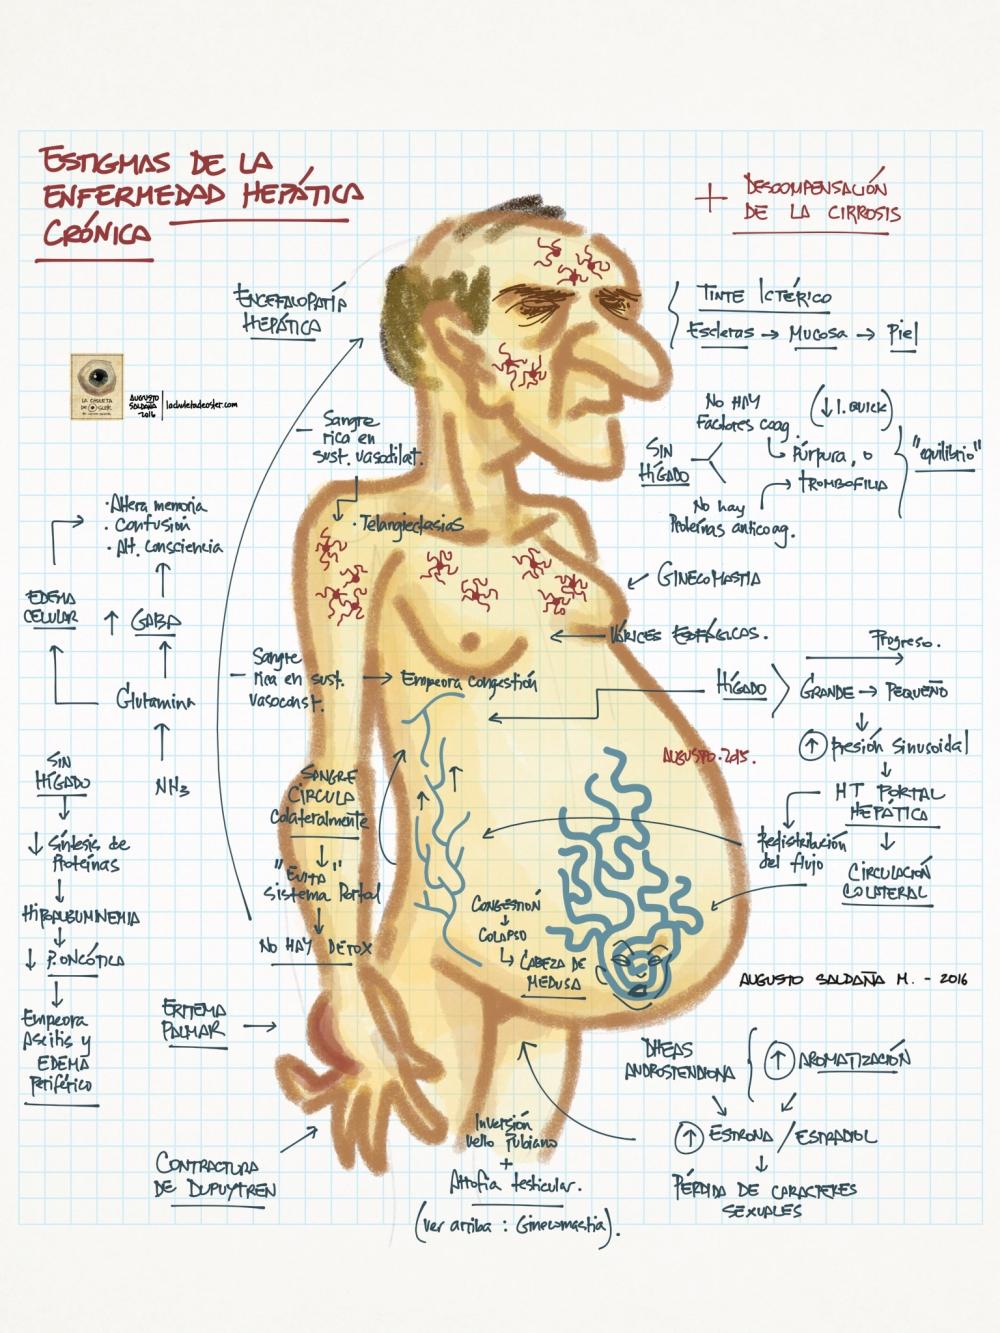 Hepatopatía_crónica